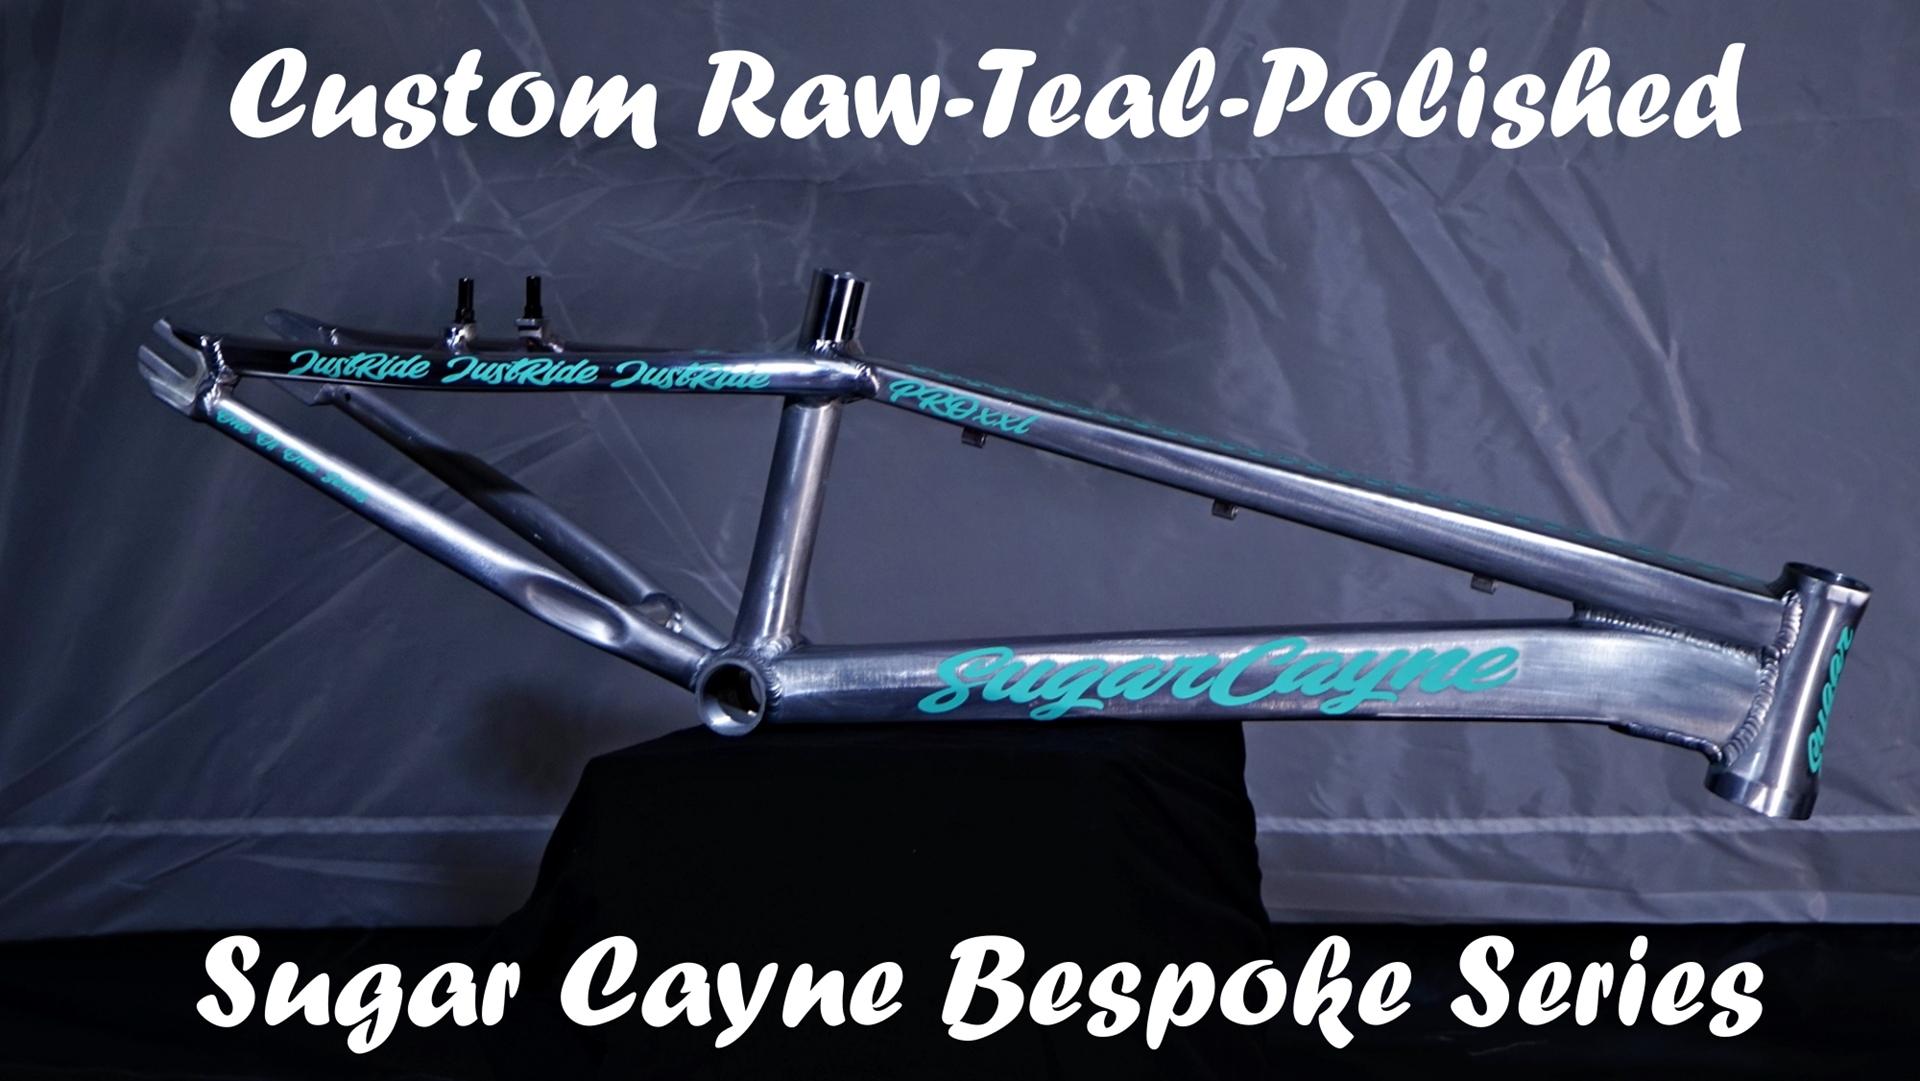 Sugar Cayne Teal Raw Besopke frame